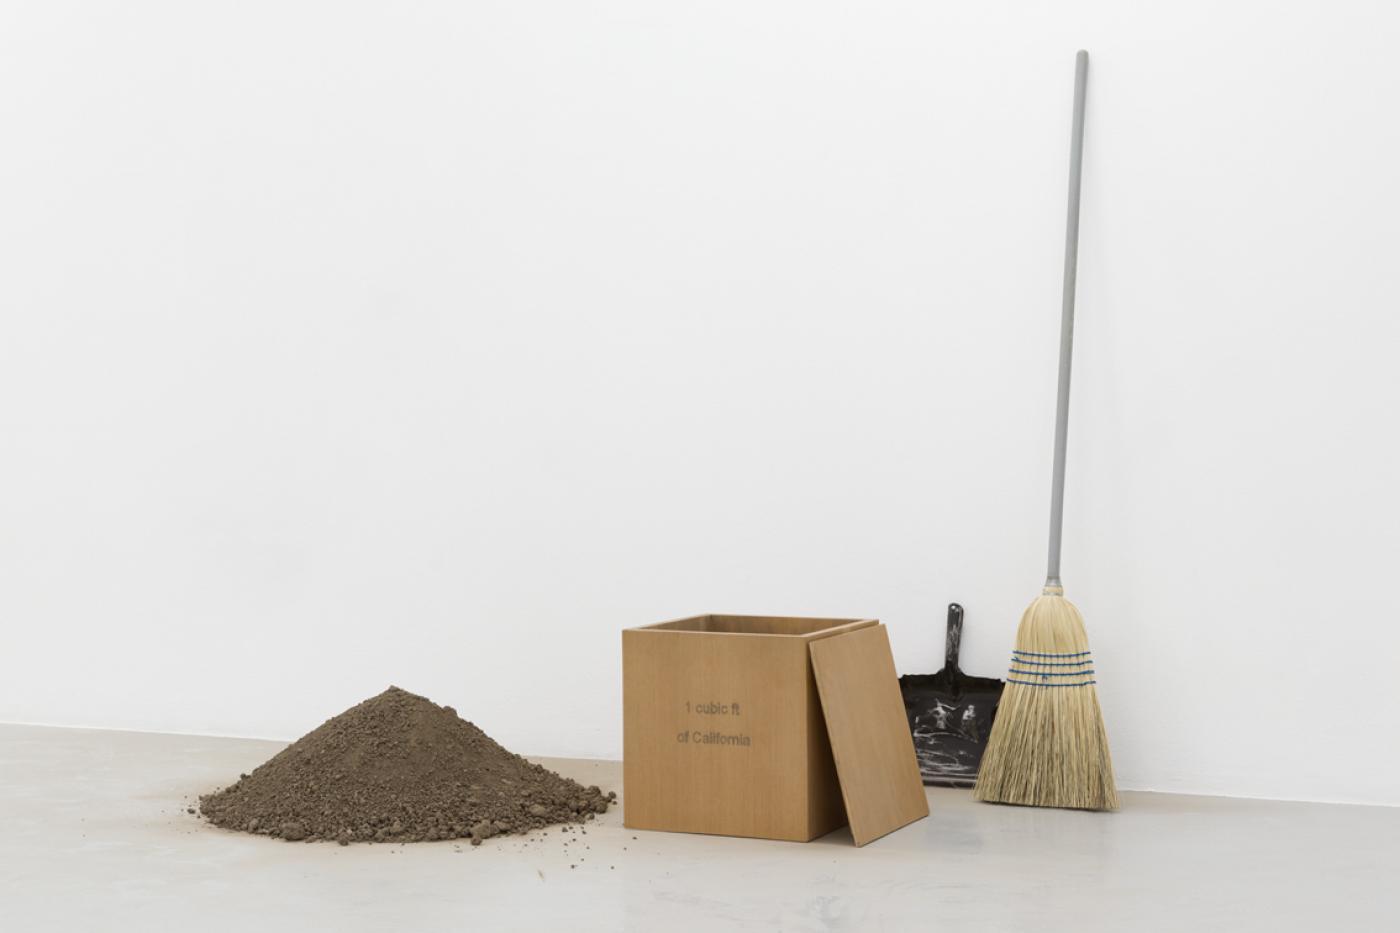 robert kinmont measure. Black Bedroom Furniture Sets. Home Design Ideas